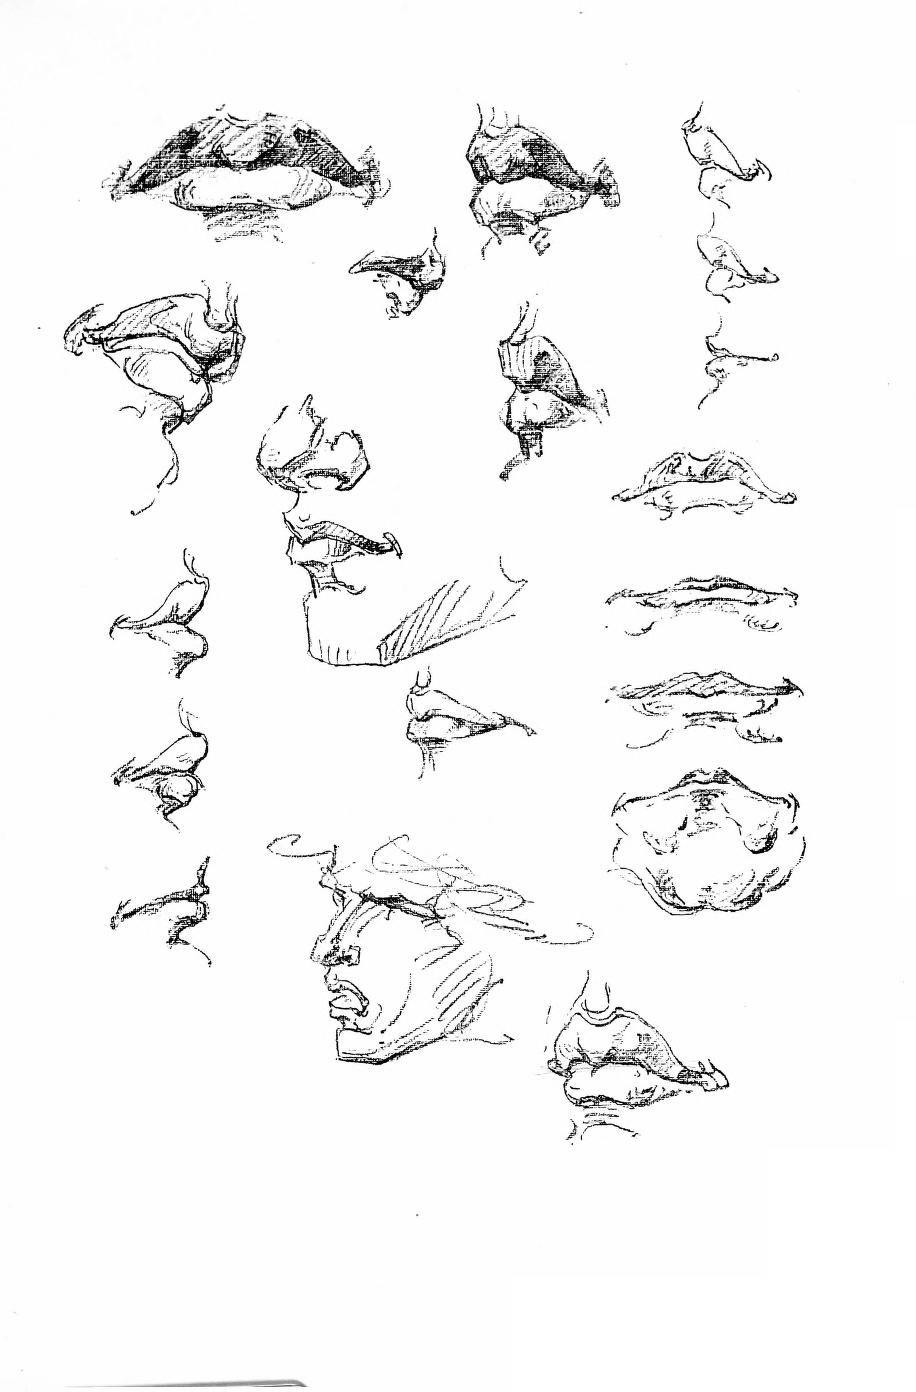 Constructive Anatomy by George Bridgman | AnatoRef - Art Anatomy ...